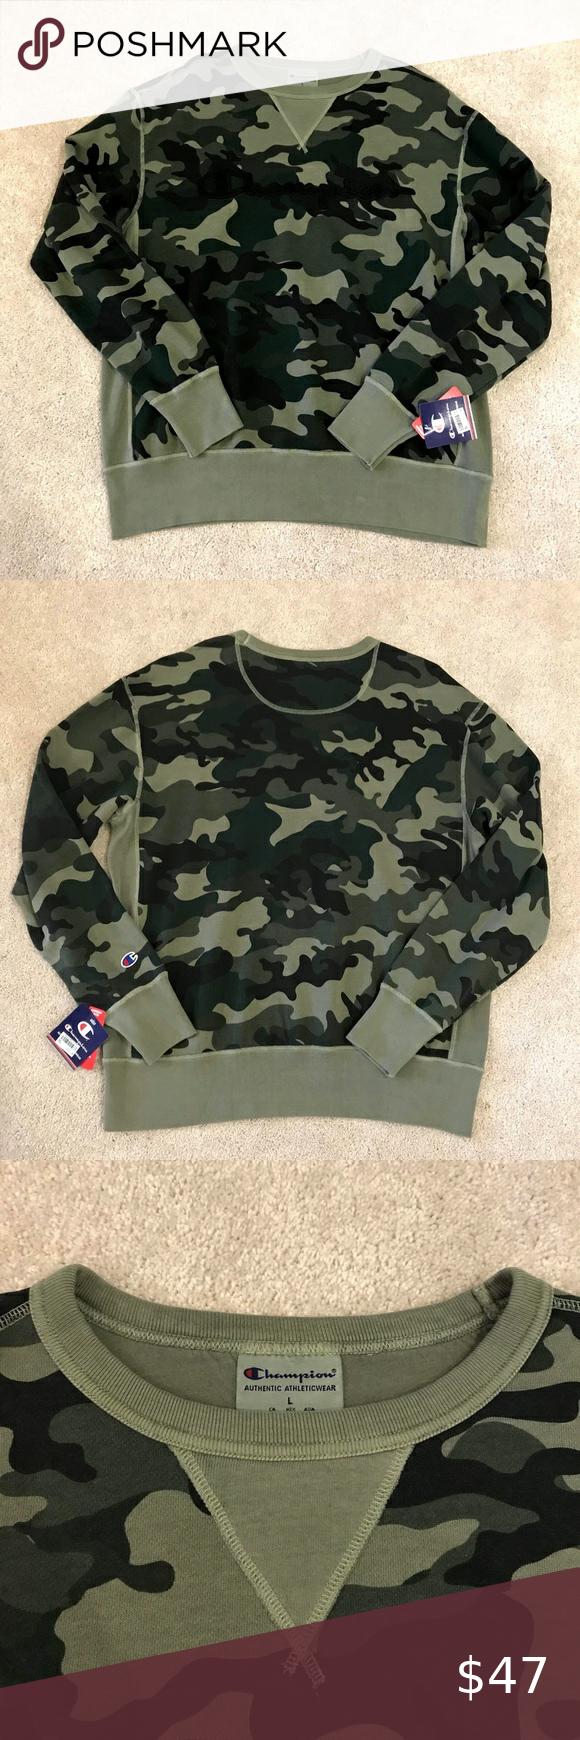 Camo Champion Sweatshirt Champion Sweatshirt Sweatshirts Sweaters [ 1740 x 580 Pixel ]